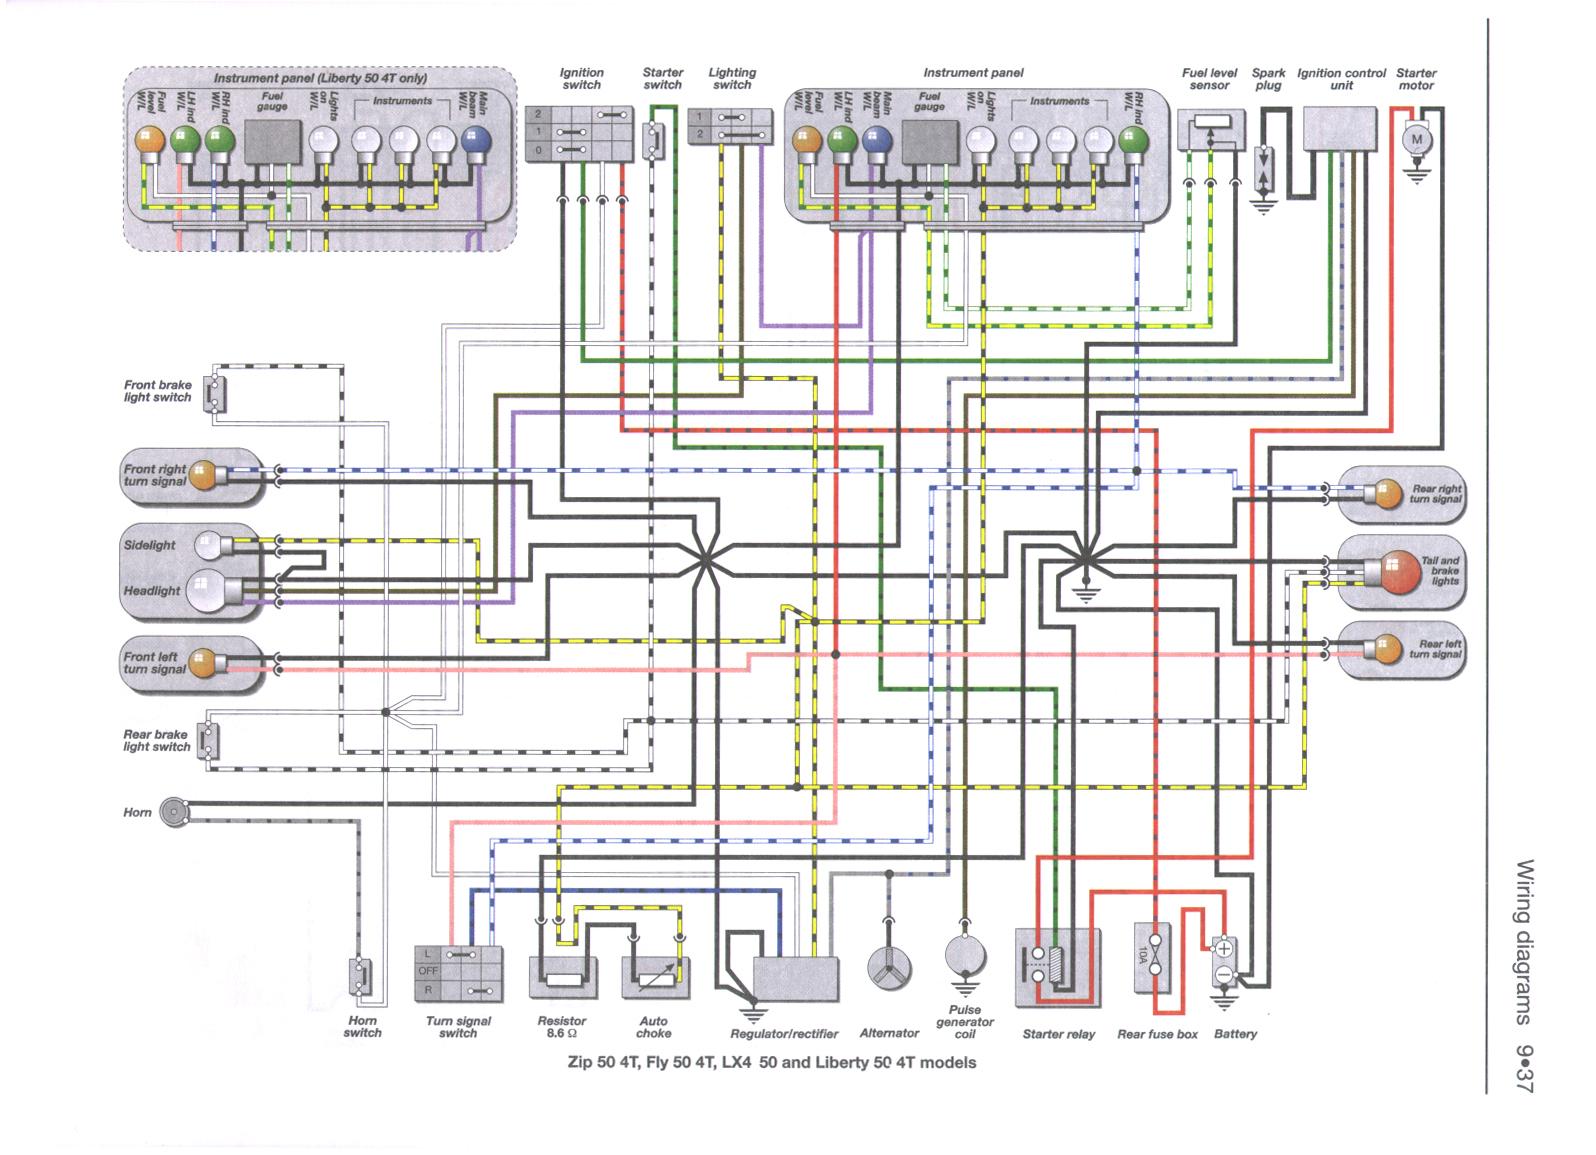 xtreme typhoon atv wiring diagram index of /manuals/circuits/ linhai atv wiring diagram #14